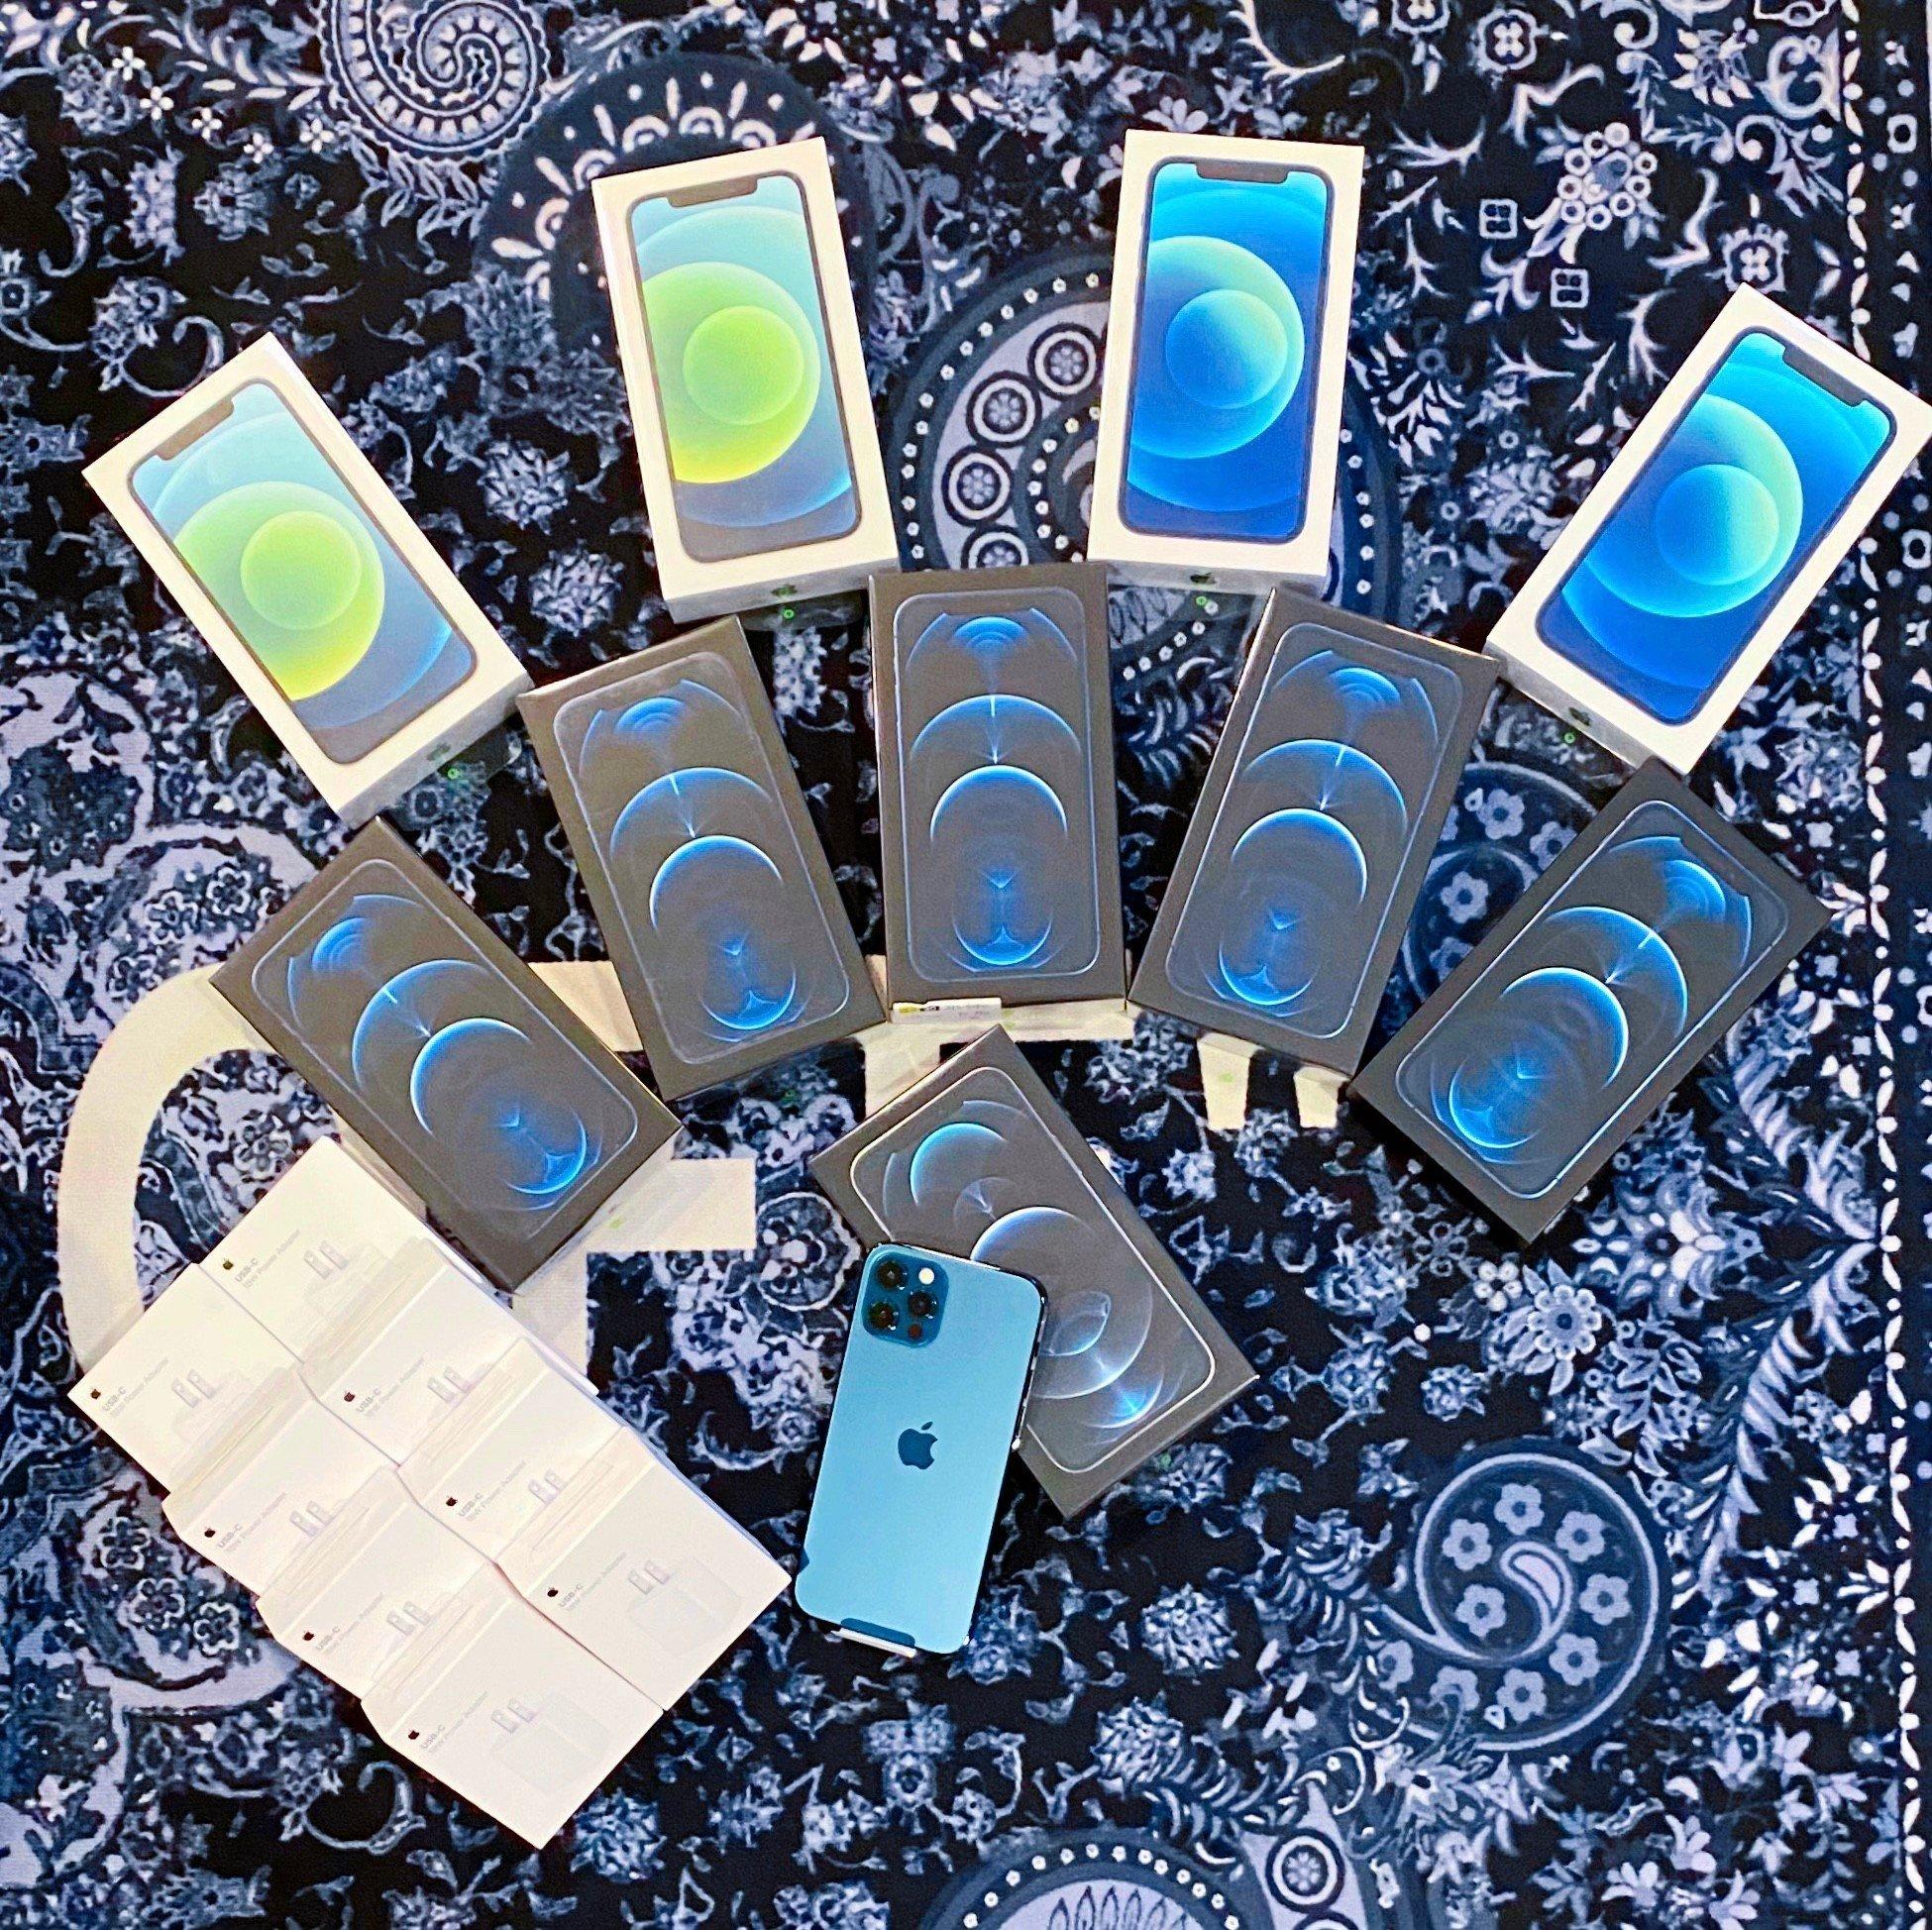 iPhone 12 Pro 128G 全新公司貨 金銀灰 太平洋藍 11 XR Xs Max 256G  512G 參考